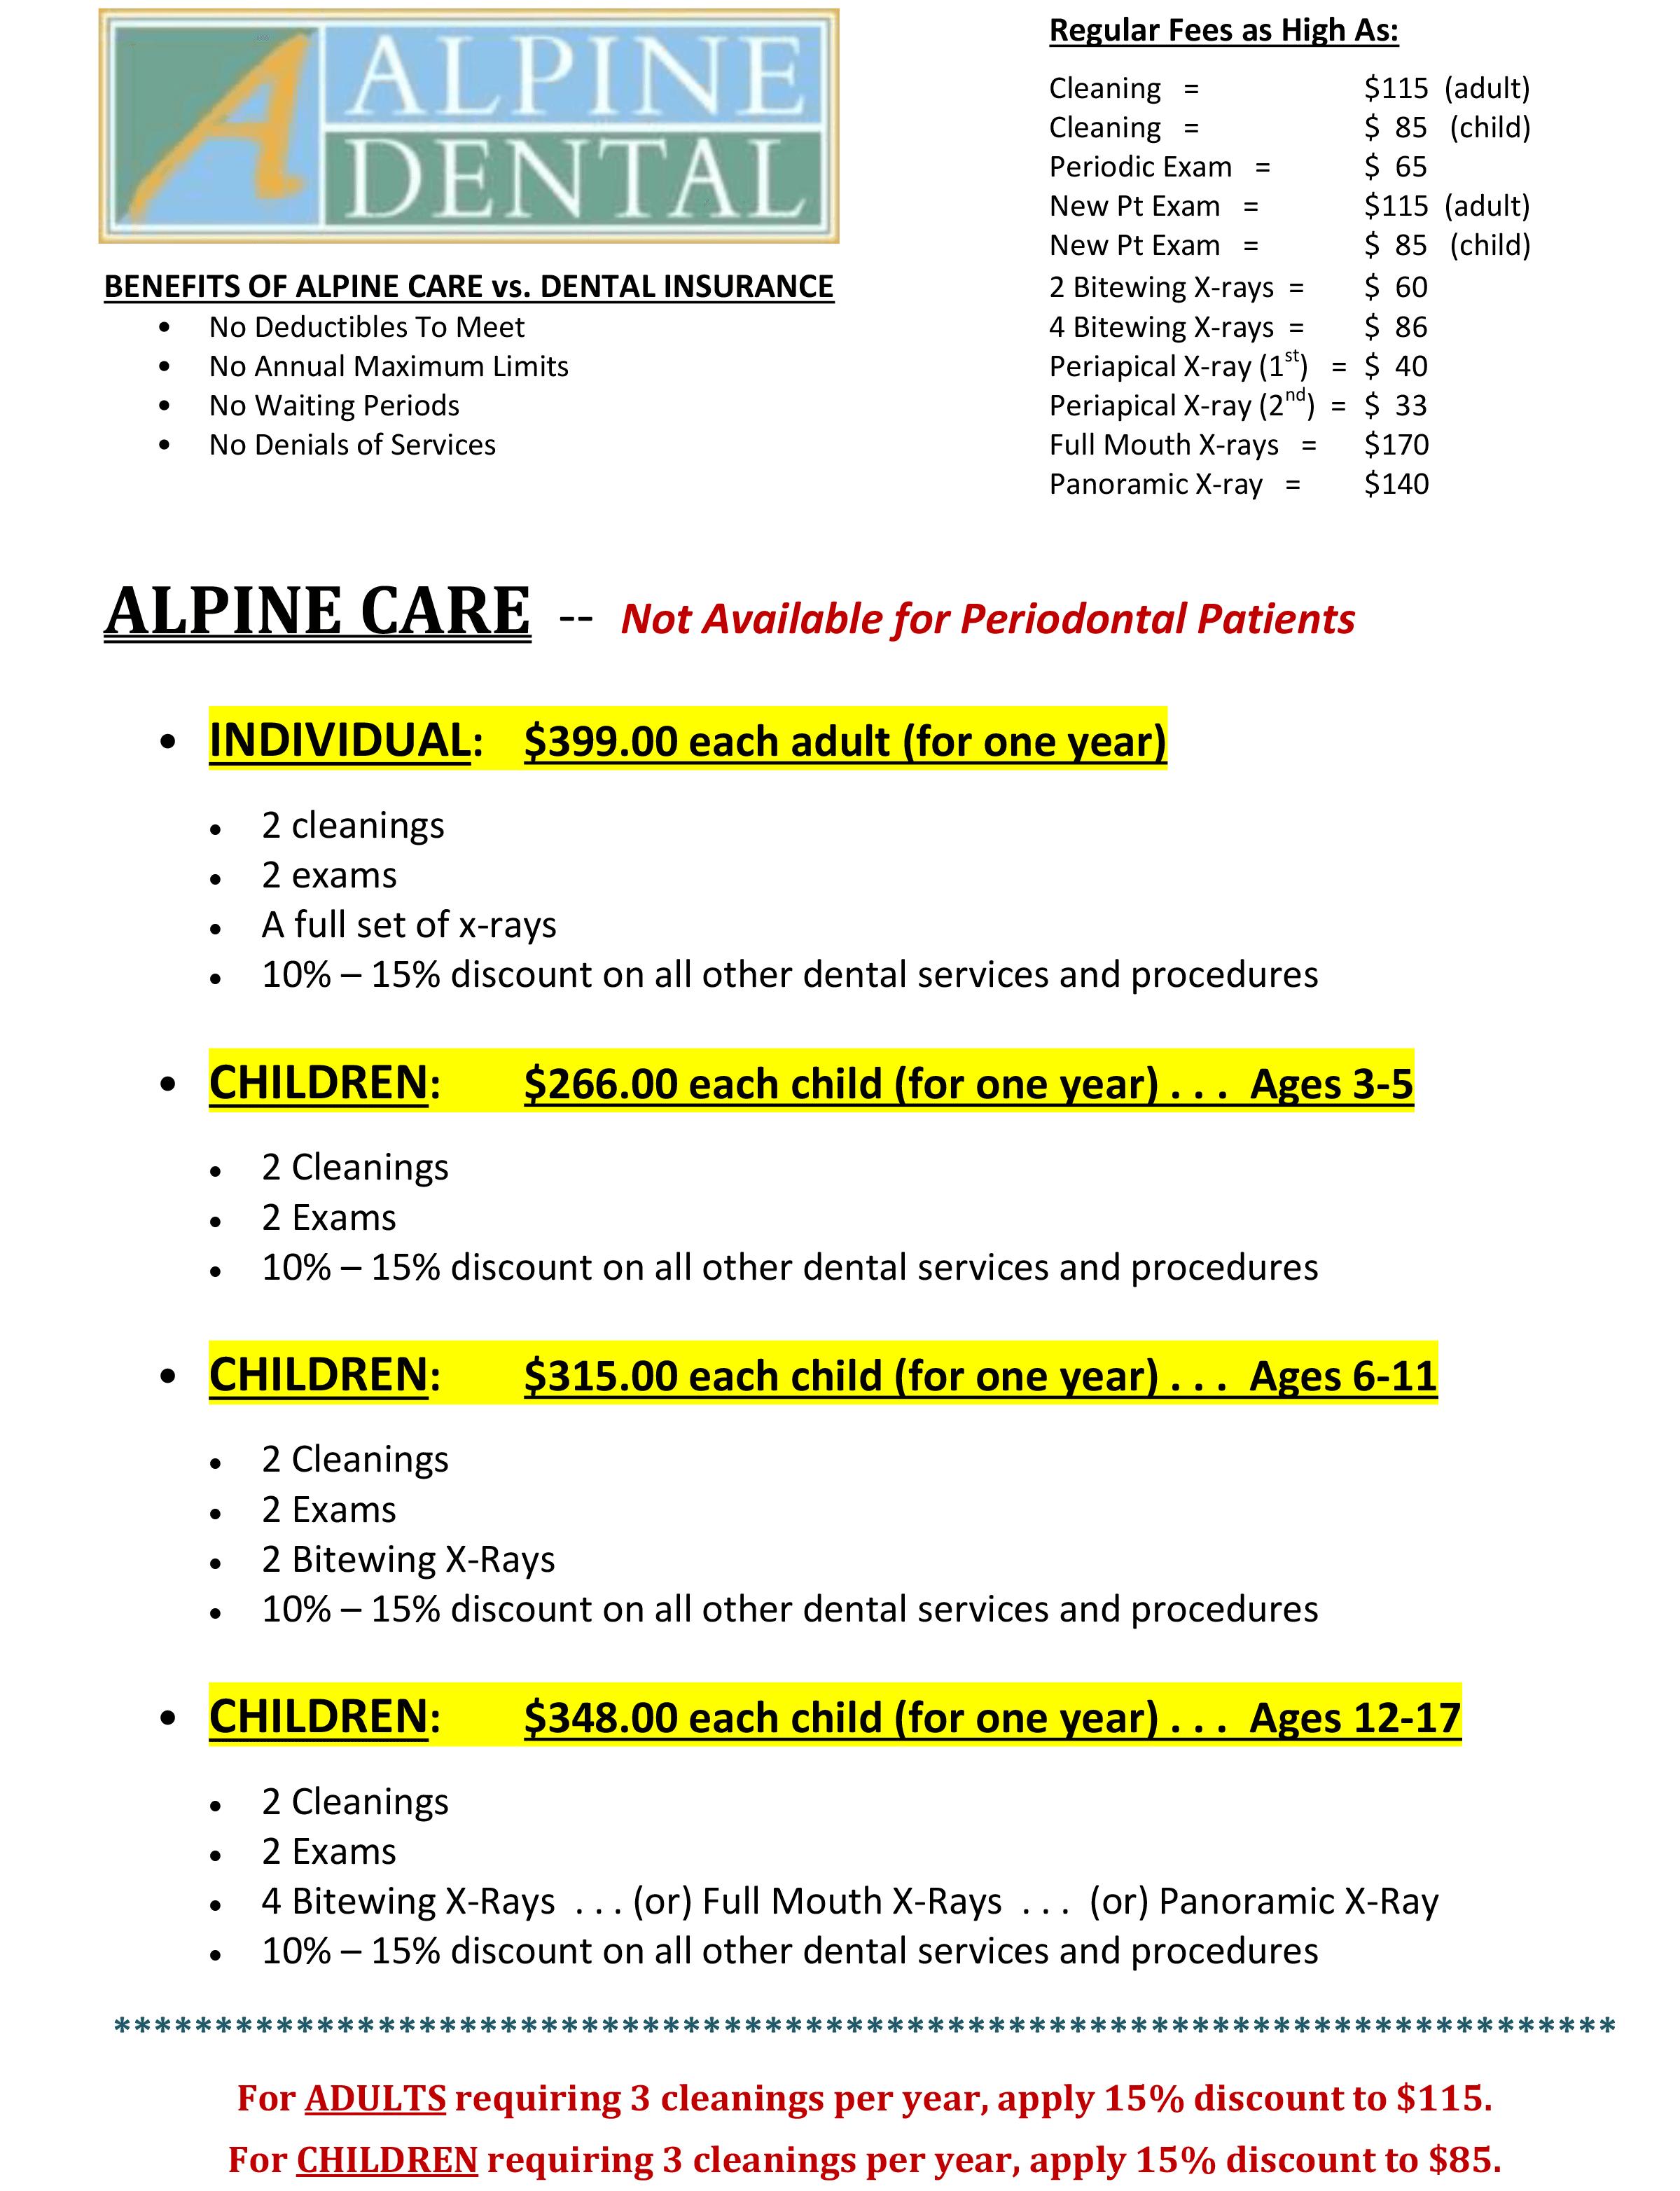 Our Alpine Savings Plan spreadsheet